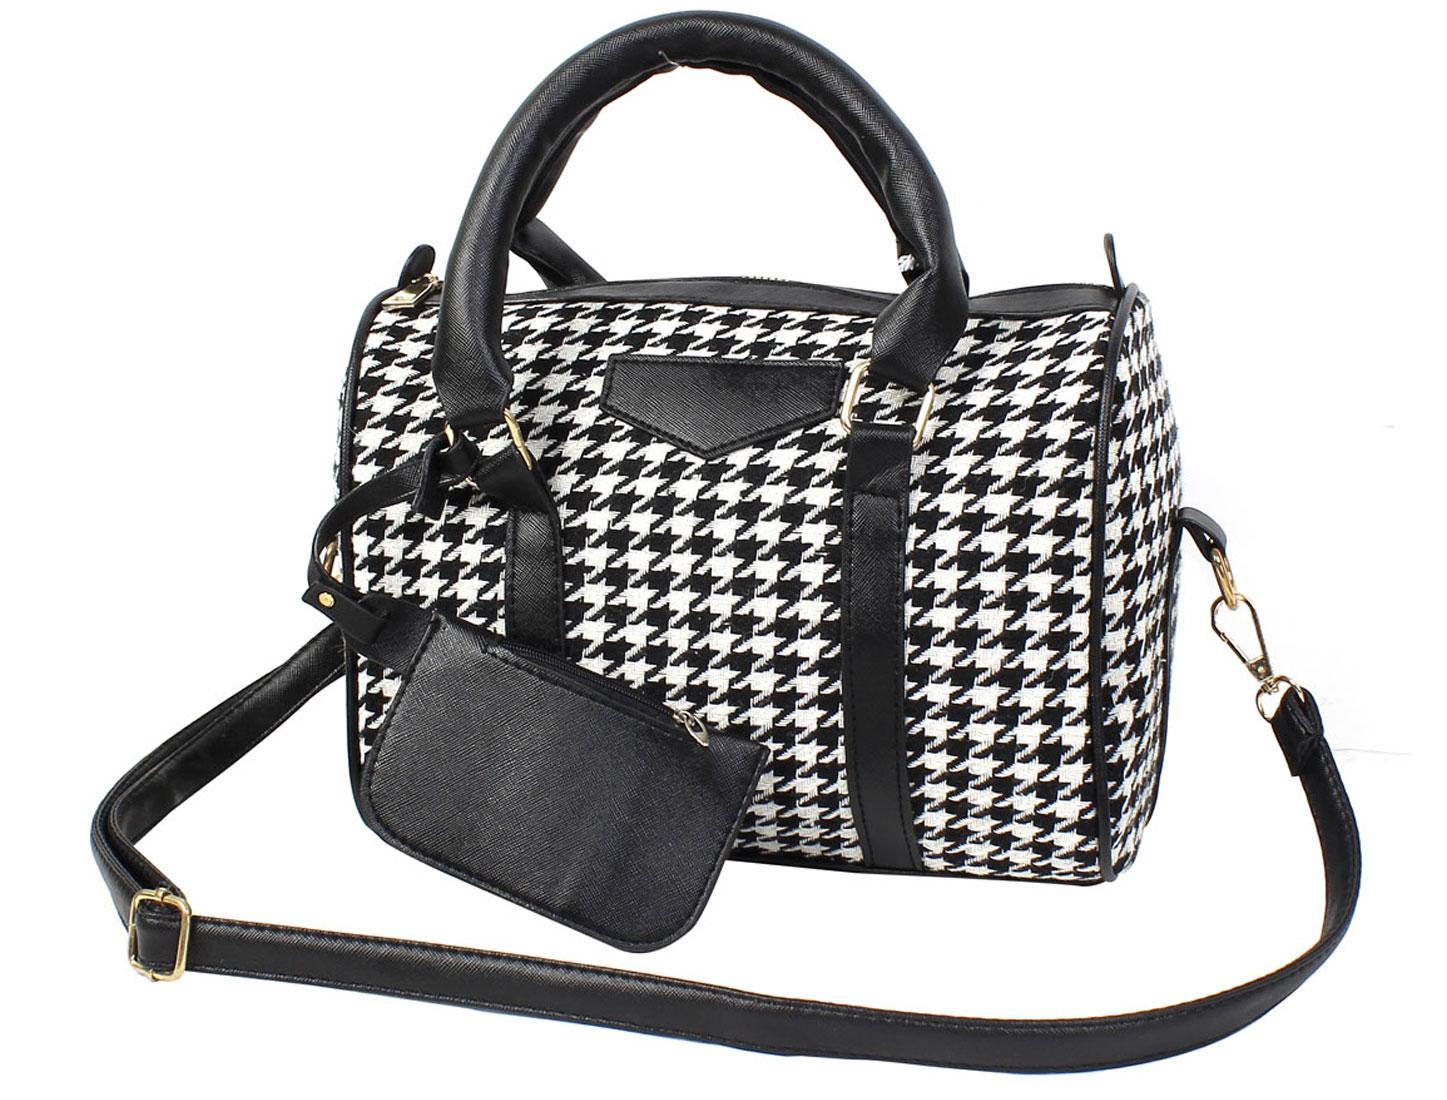 2015 New Woman Houndstooth Tote Messenger Crossbody Handbag Shoulder Bag